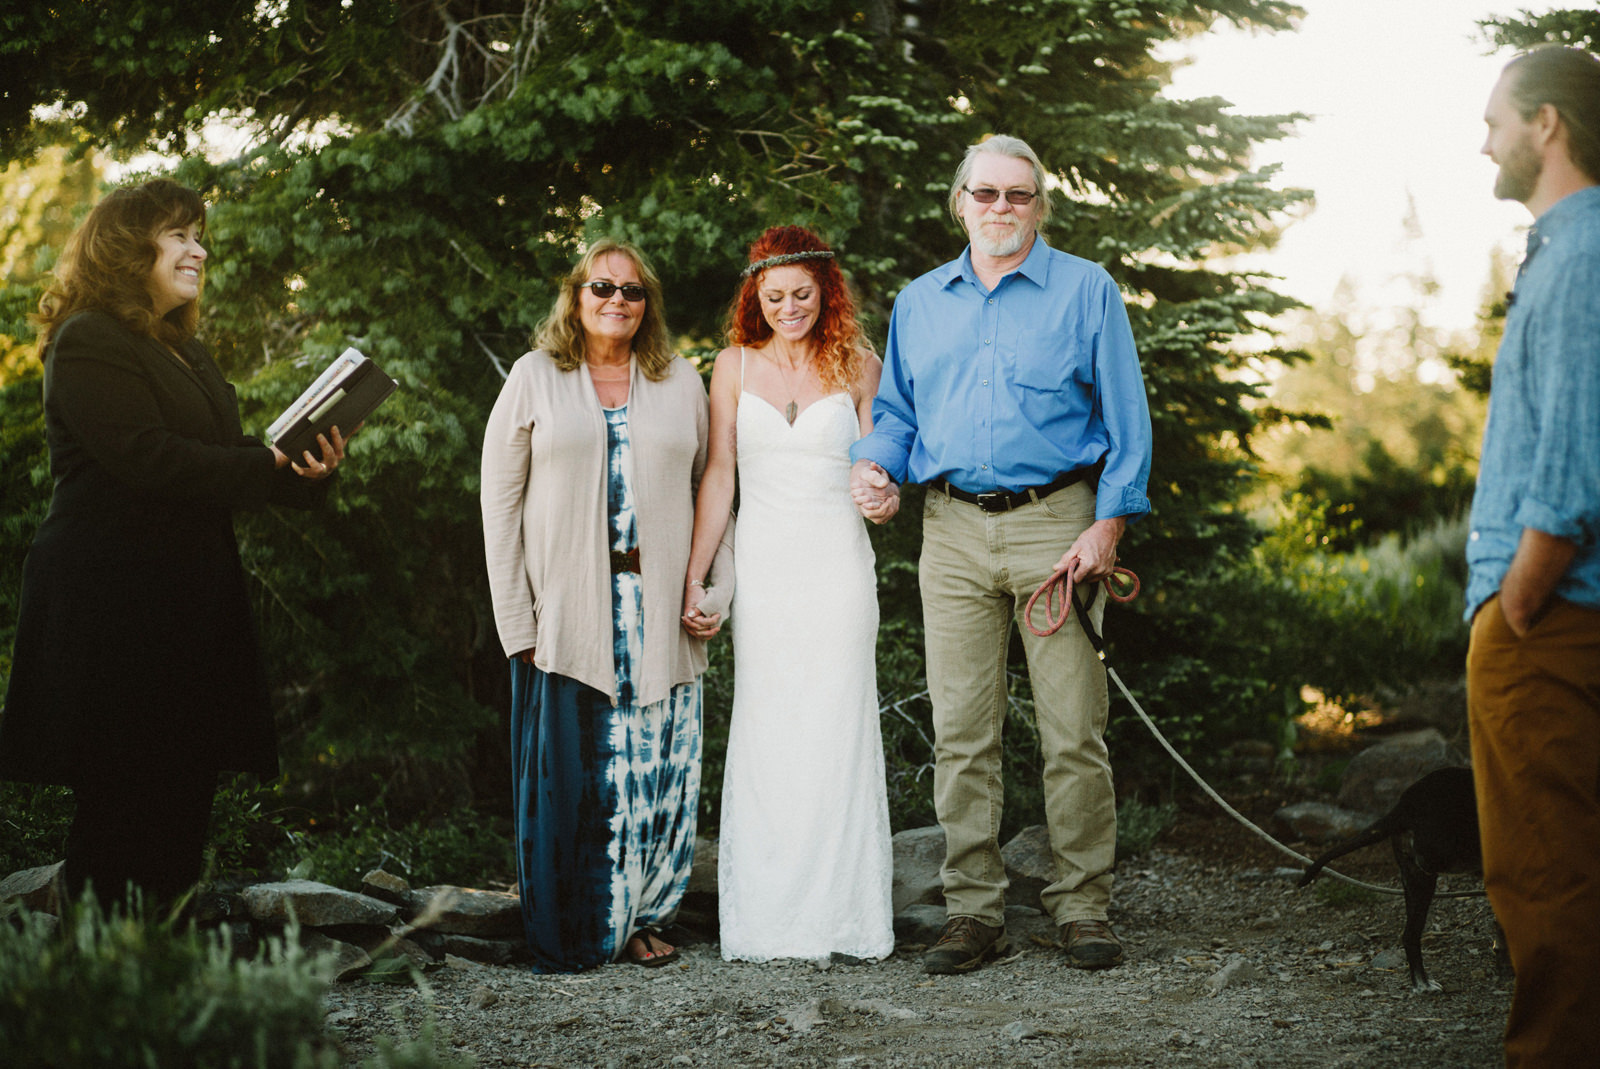 lake-tahoe-elopement-061 LAKE TAHOE ELOPEMENT